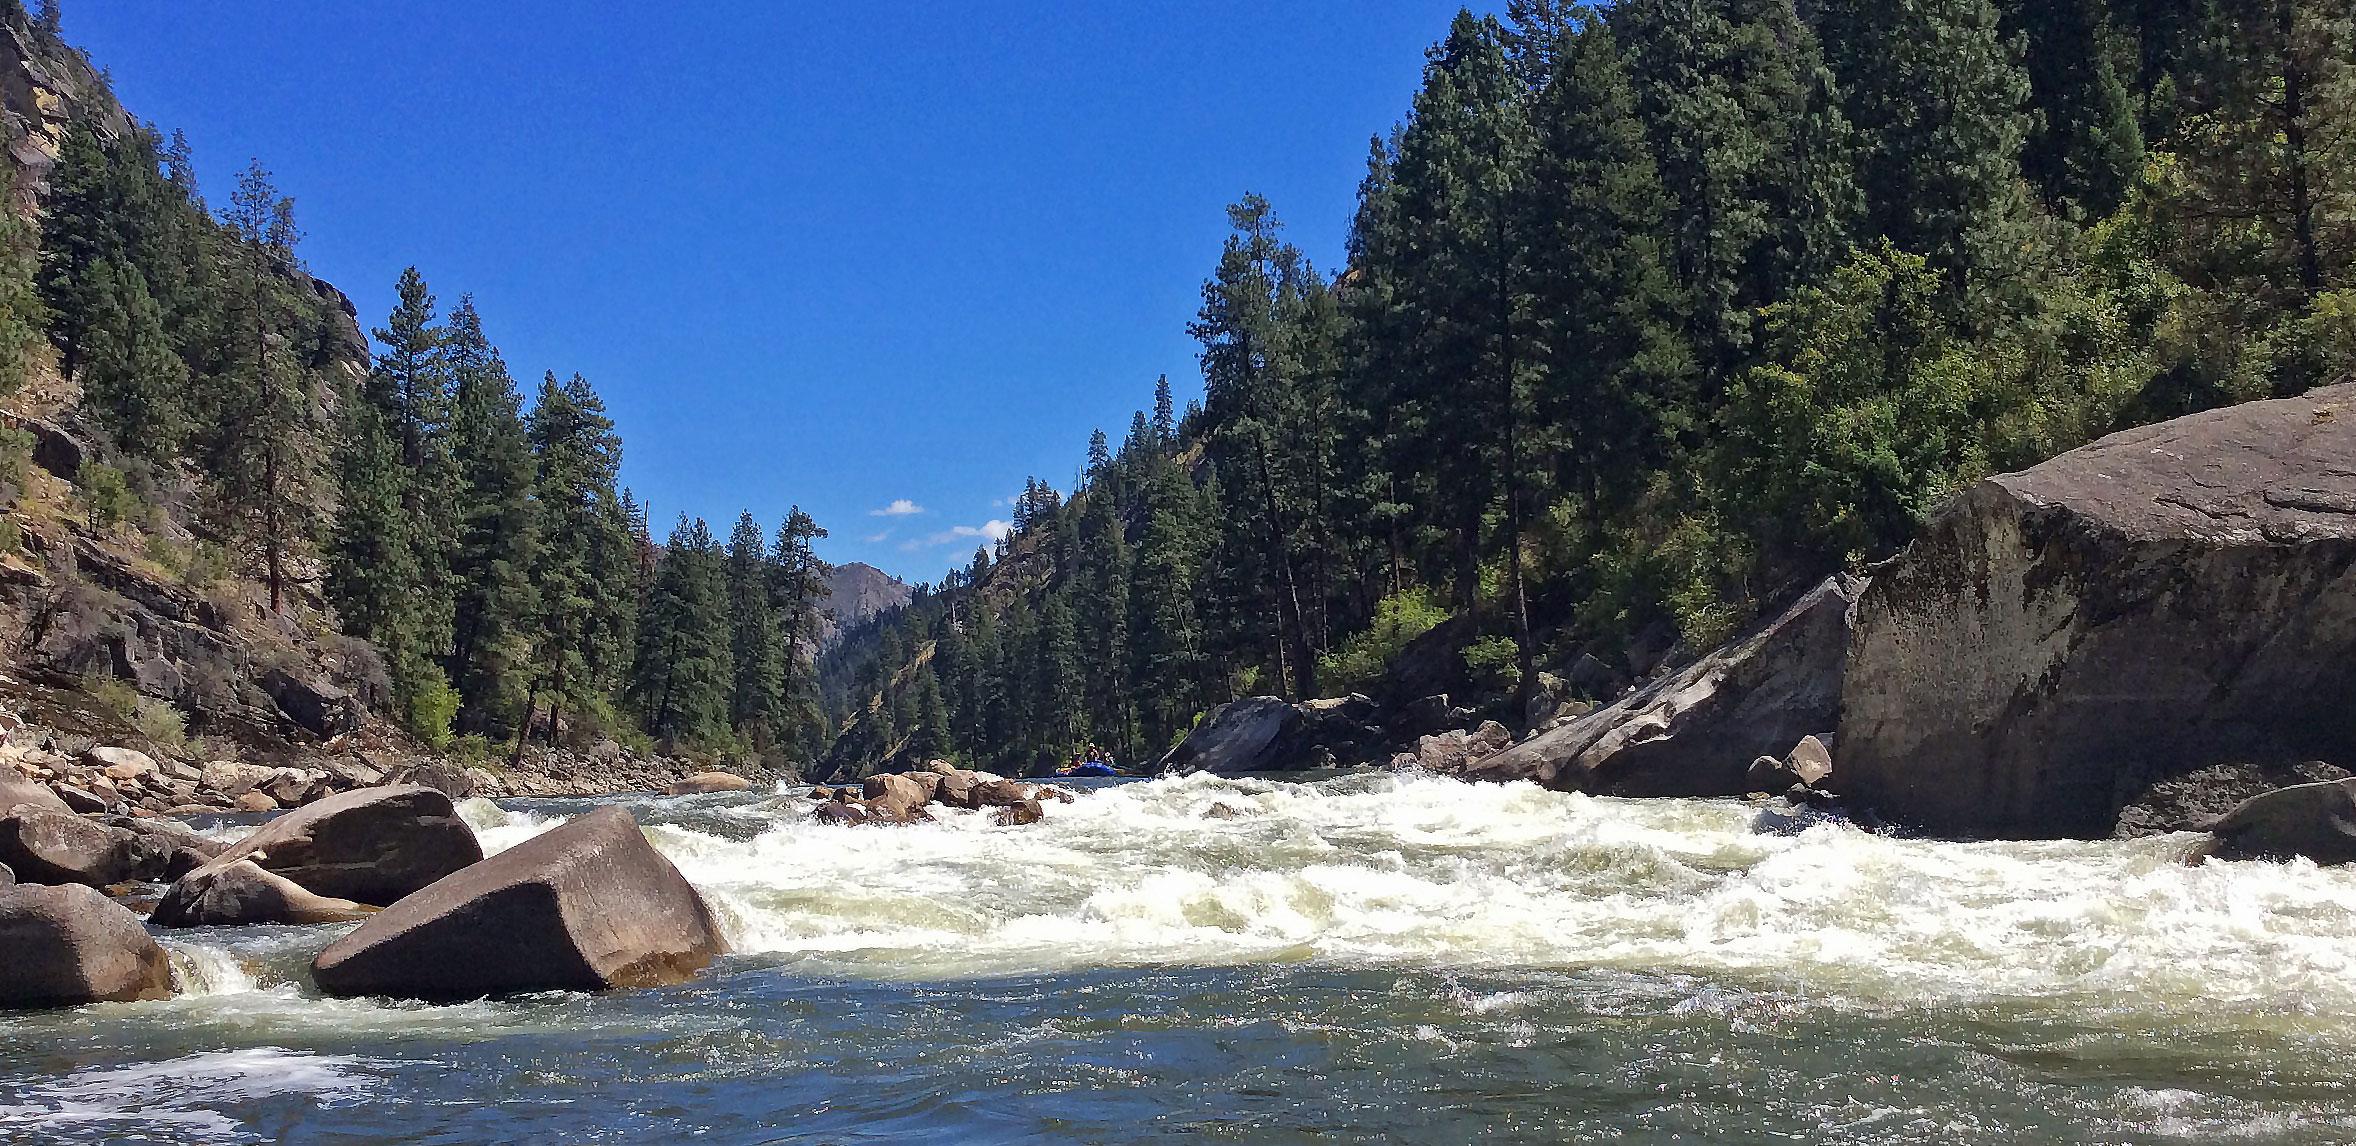 Idaho Salmon - Rafting the River of No Return